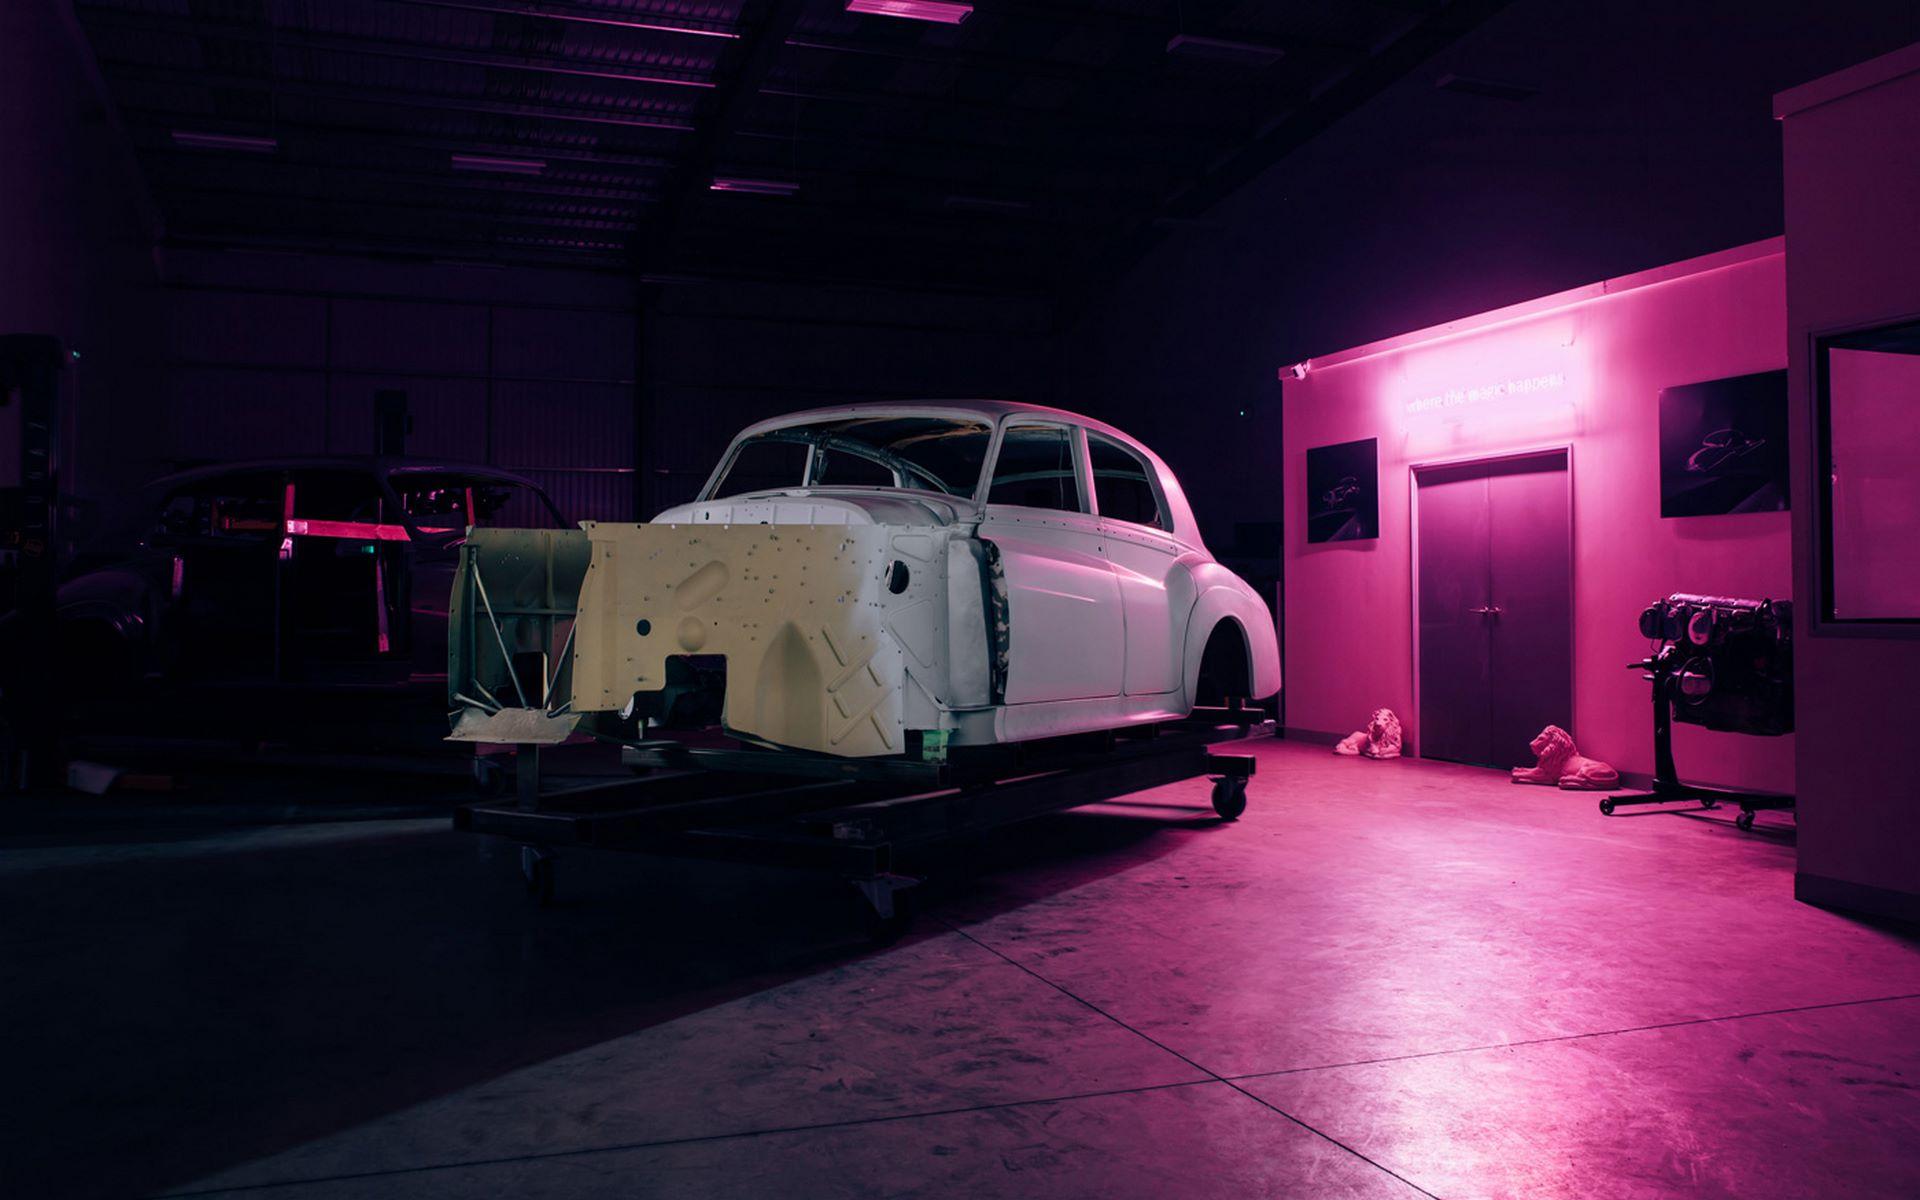 Electris-Rolls-Royce-Phantom-V-and-Silver-Cloud-by-Lunaz-5